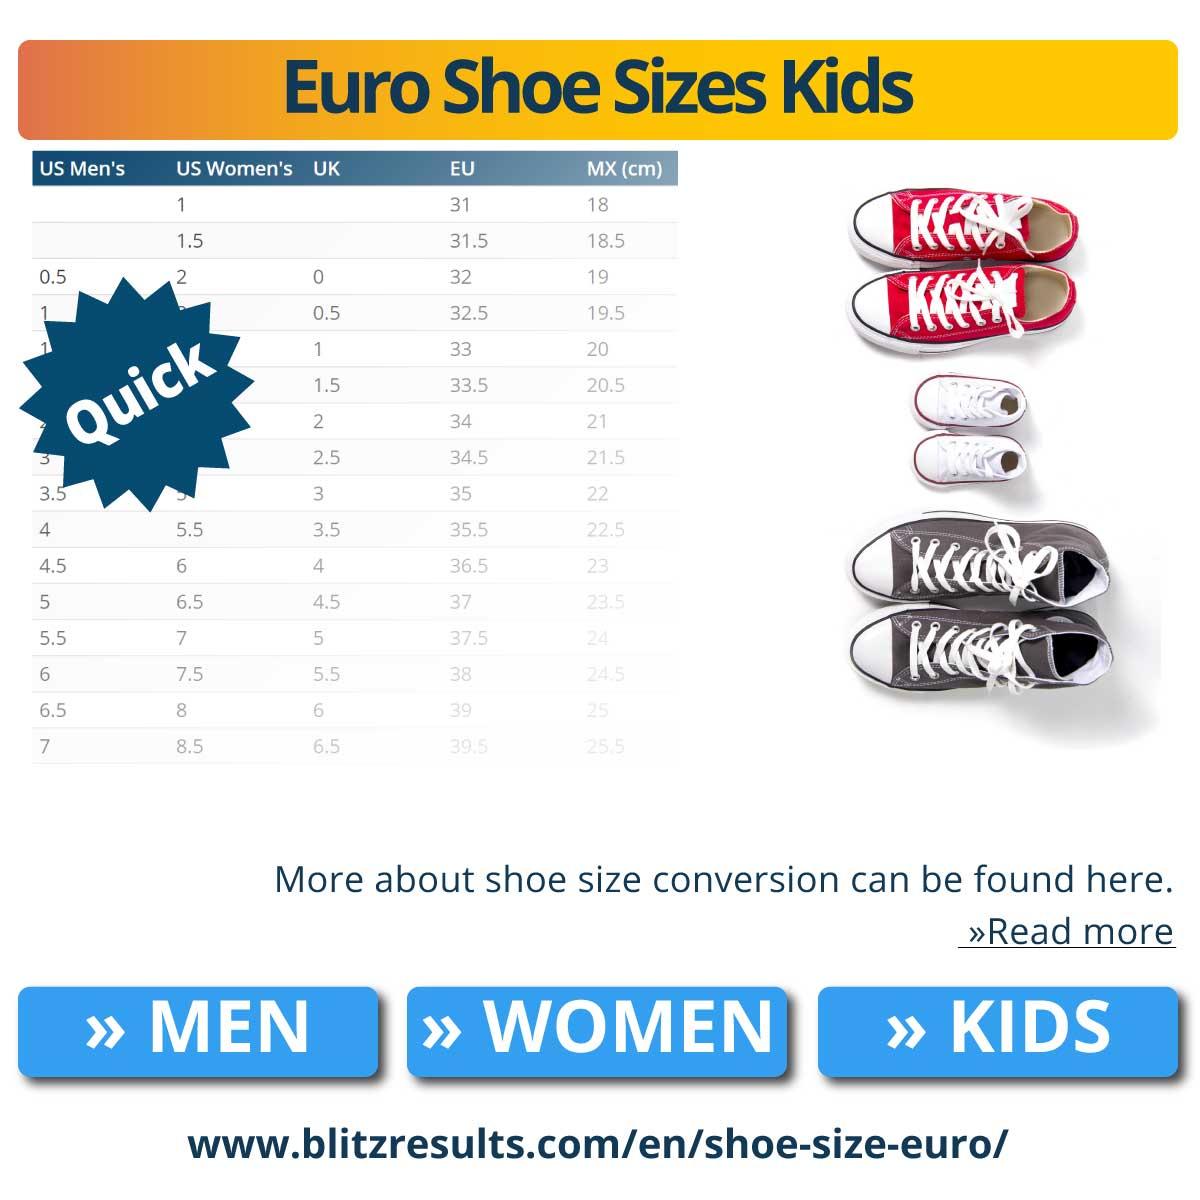 Euro Shoe Sizes Kids